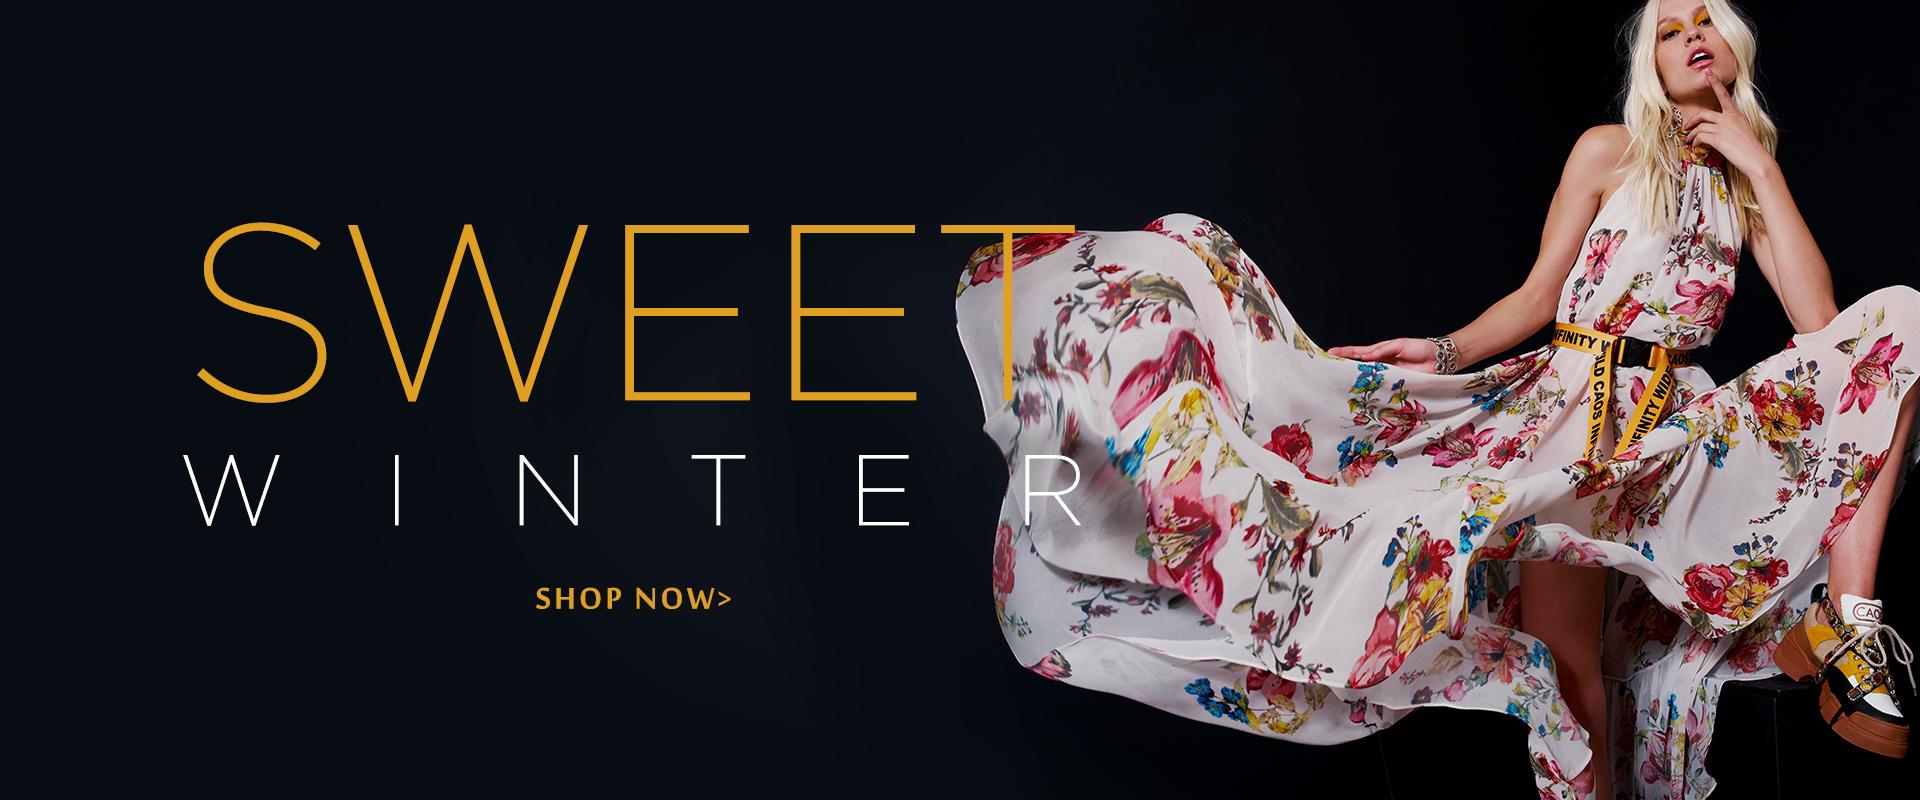 Banner-Sweet